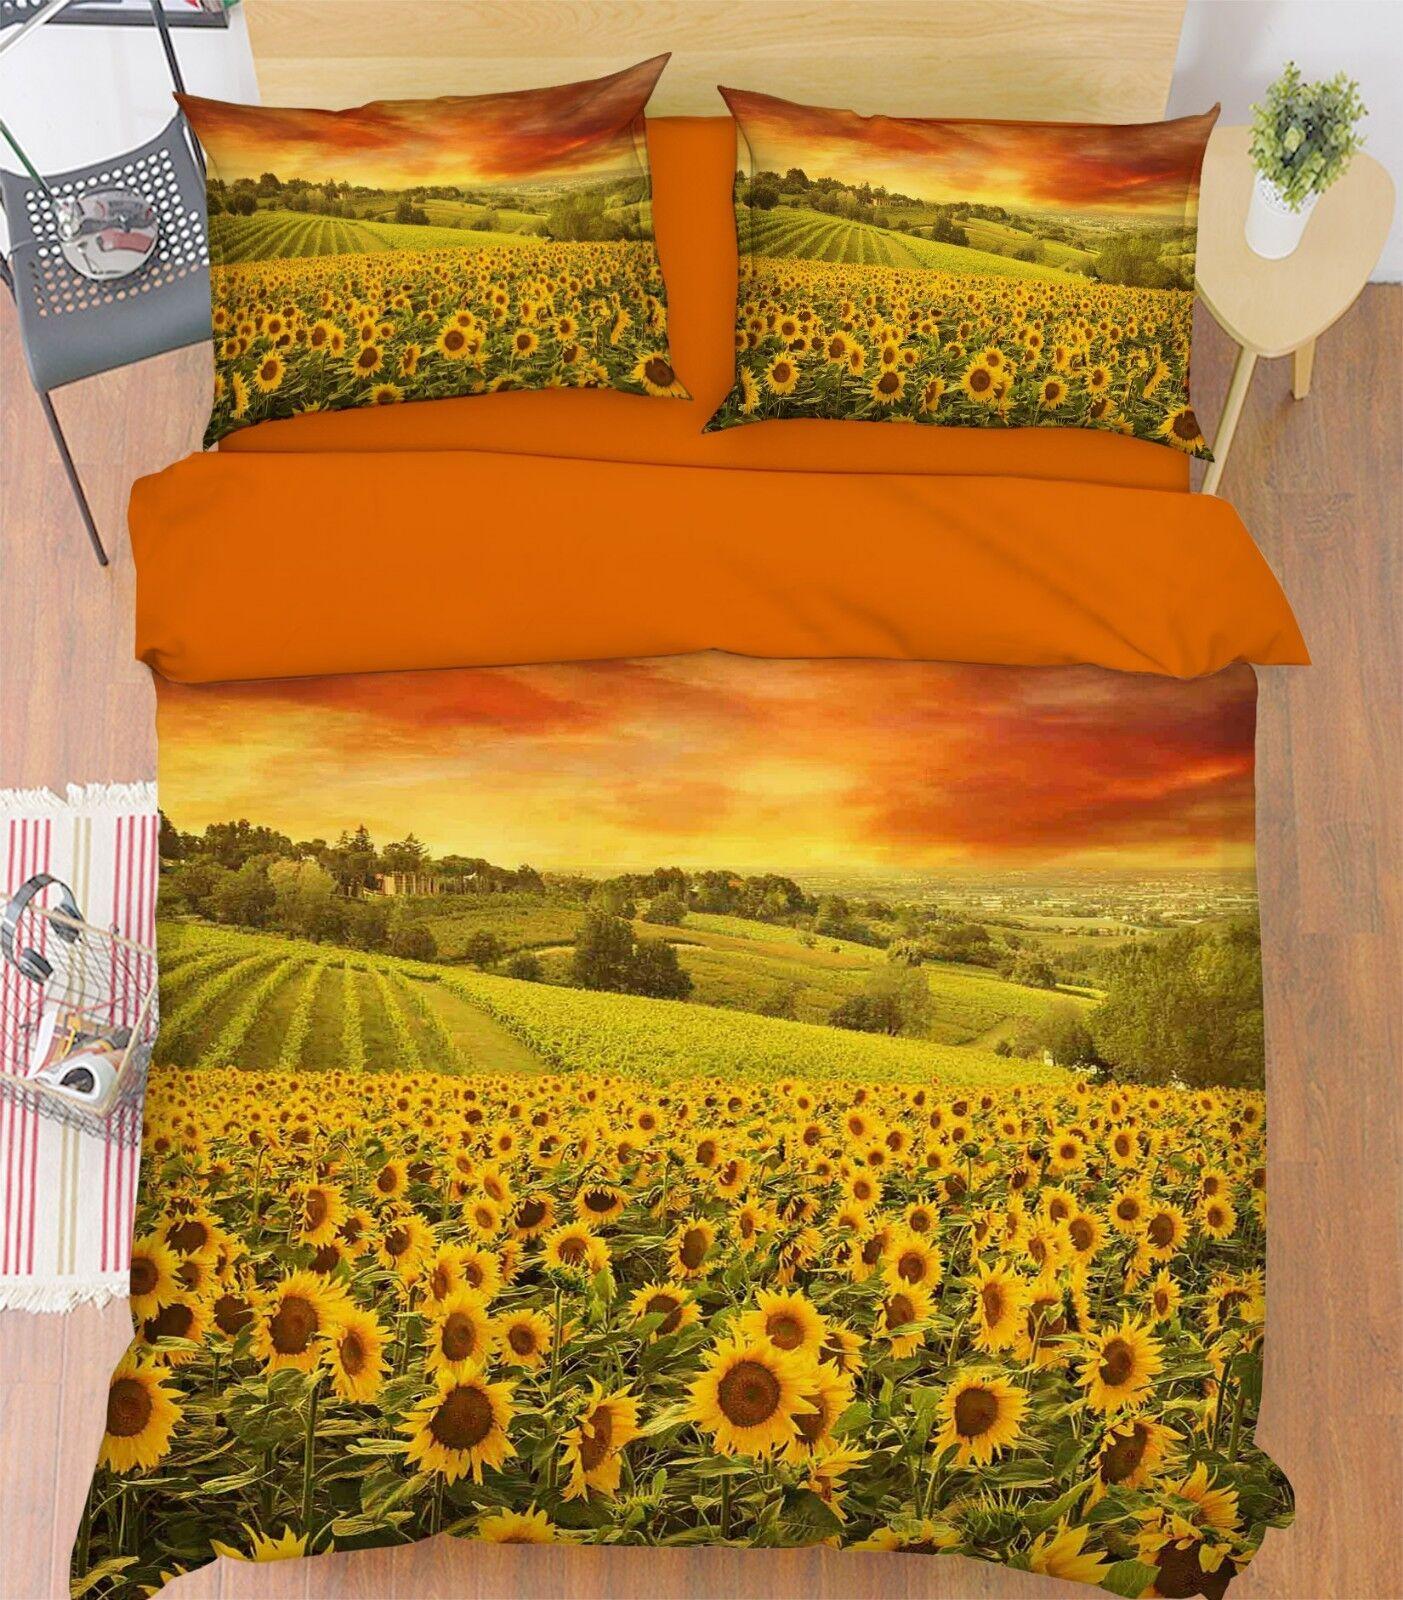 3D Sky Flowers 678 Bett Pillowcases Quilt Duvet Startseite Set Single Königin AU Carly